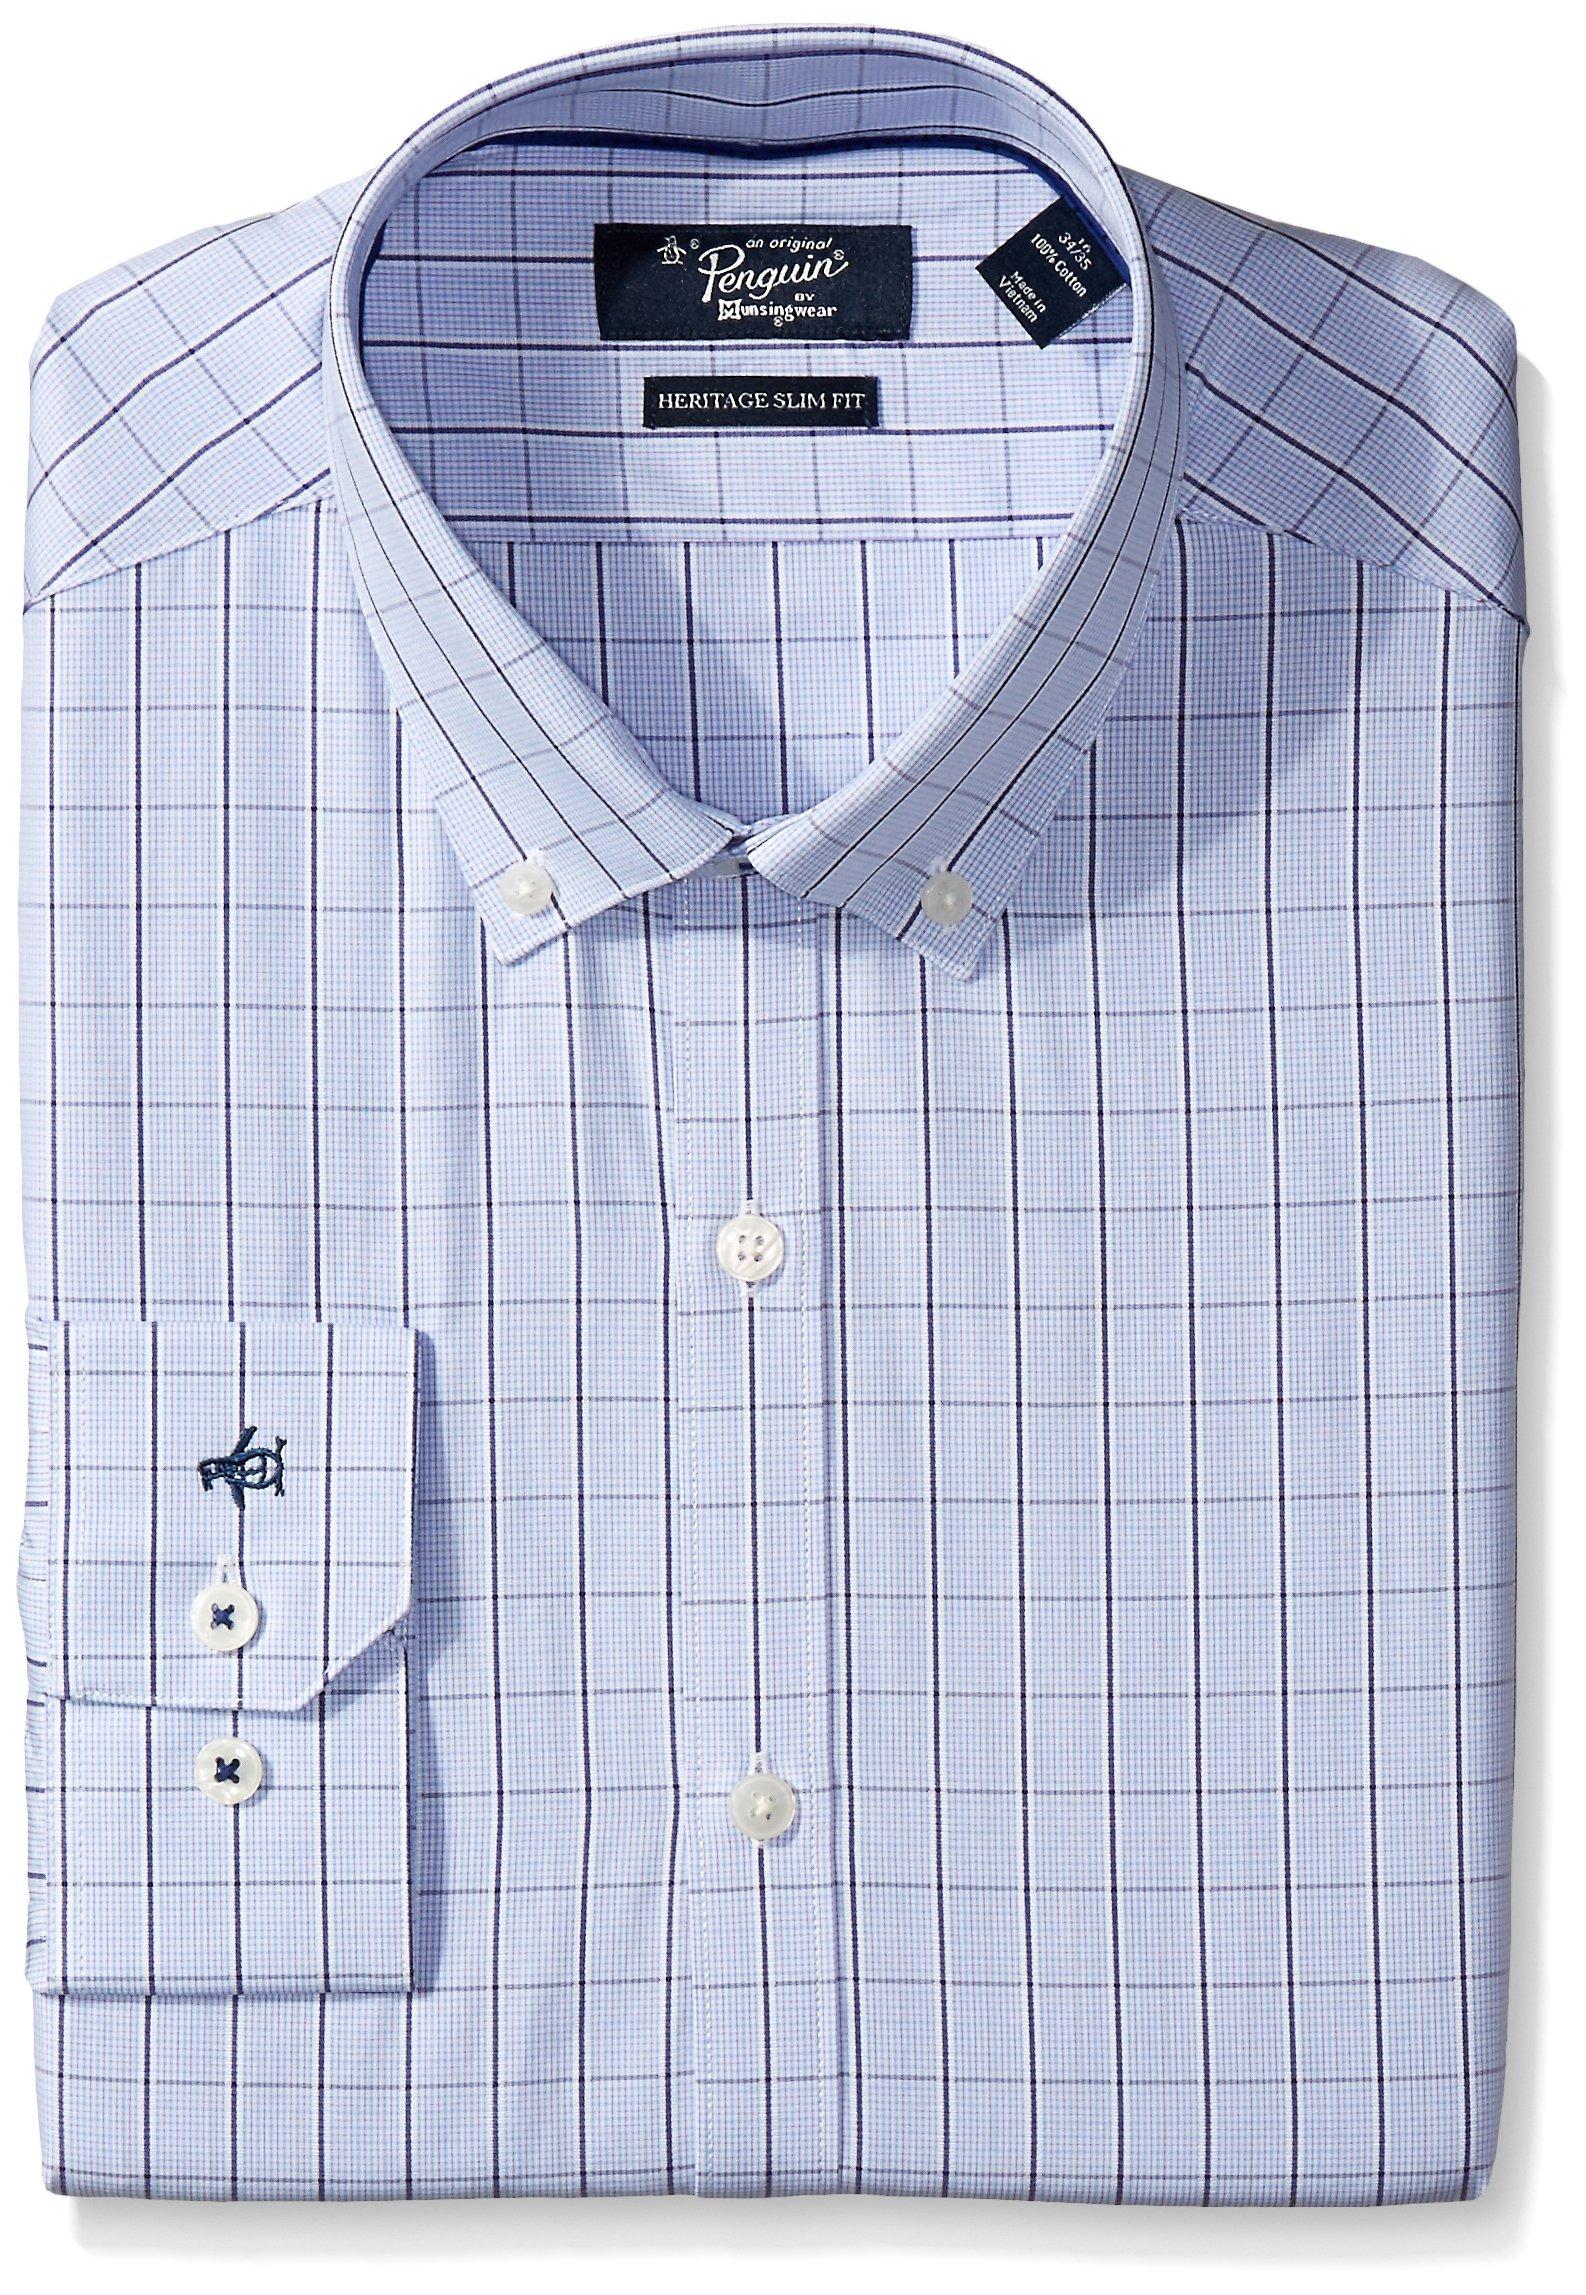 Original Penguin Men's Slim Fit Performance Spread Collar Check Dress Shirt, Blue Windowpane, 15 32/33